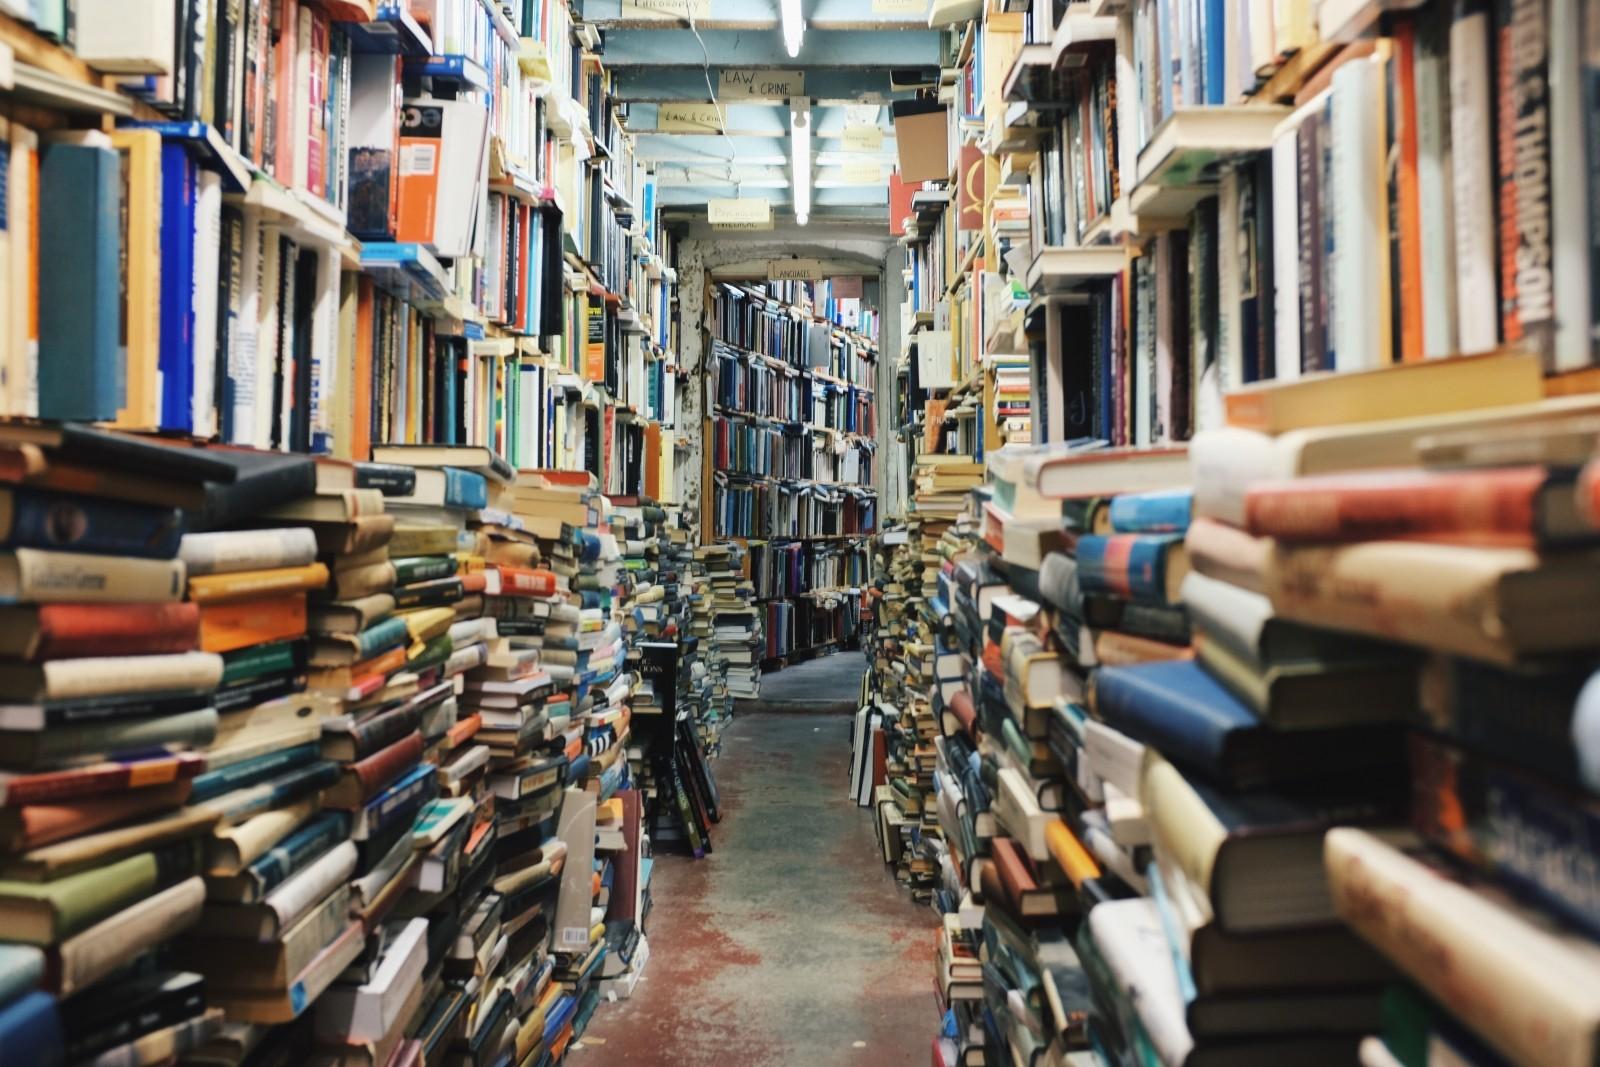 variation-of-books-in-library.jpg